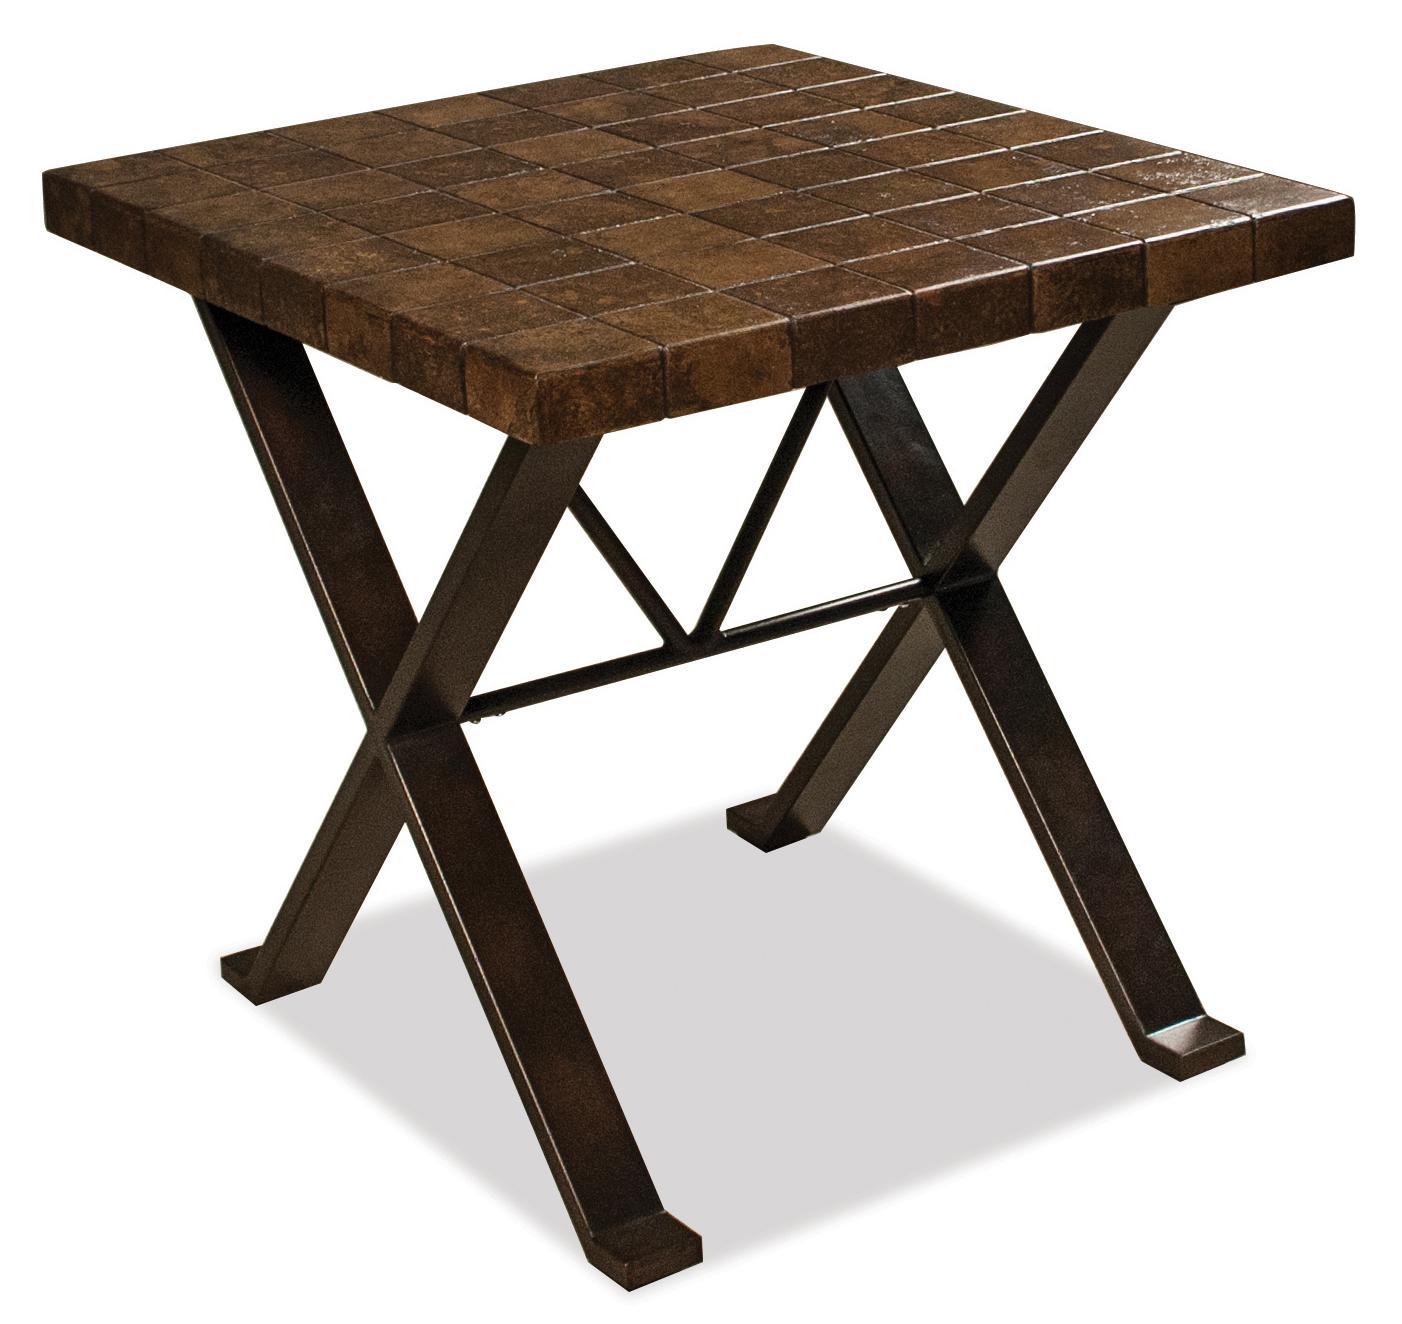 Riverside Furniture Bolero End Table               - Item Number: 91809